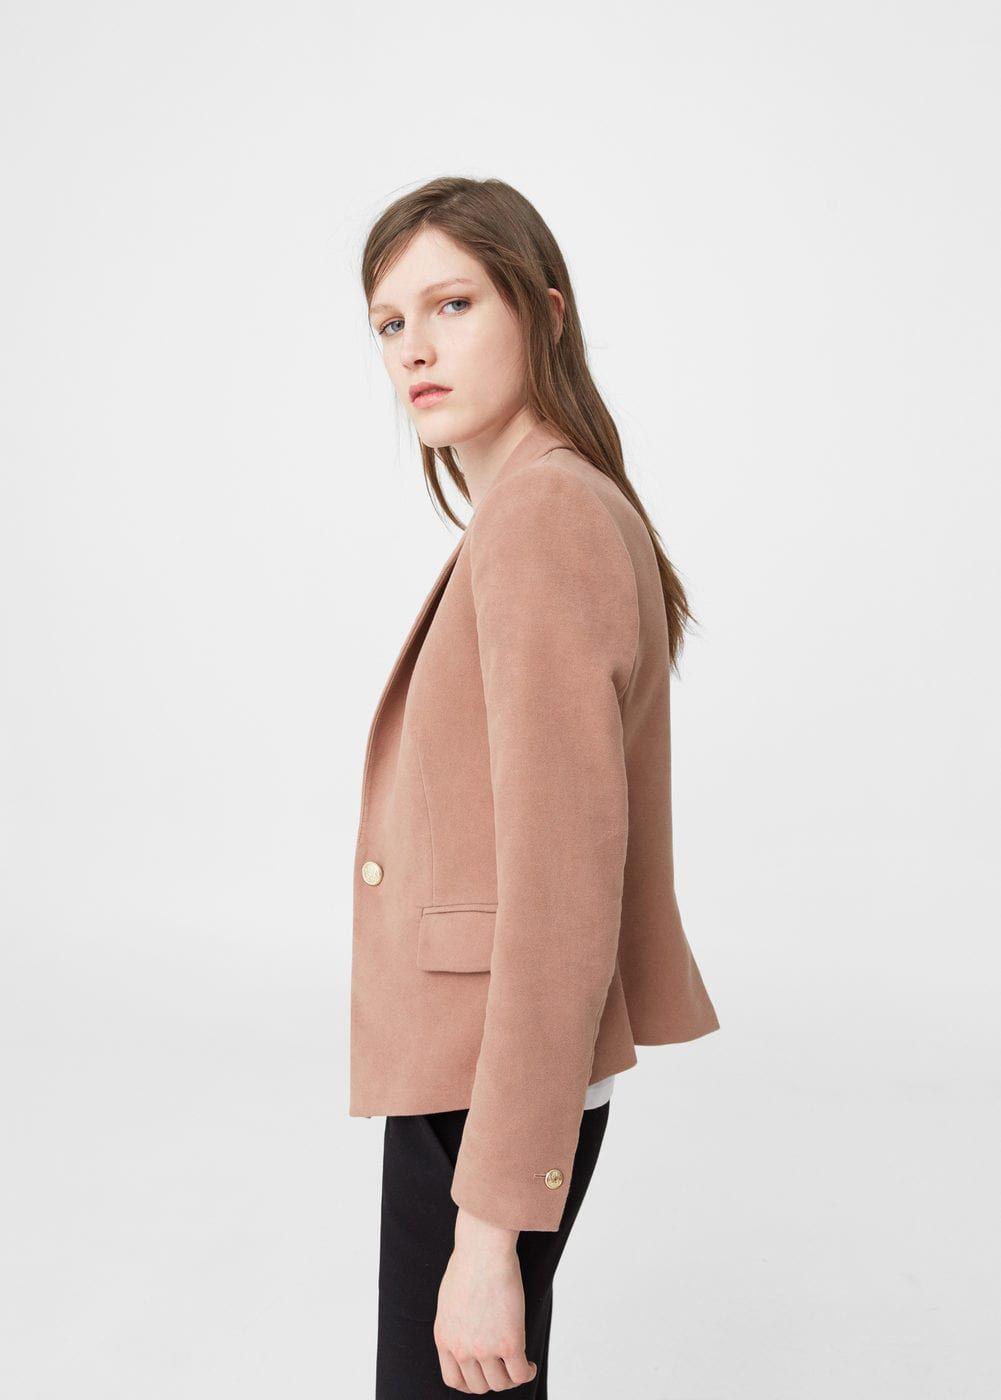 Structured Cotton Blazer Woman Mango Greece Cotton Blazer Blazers For Women Clothes